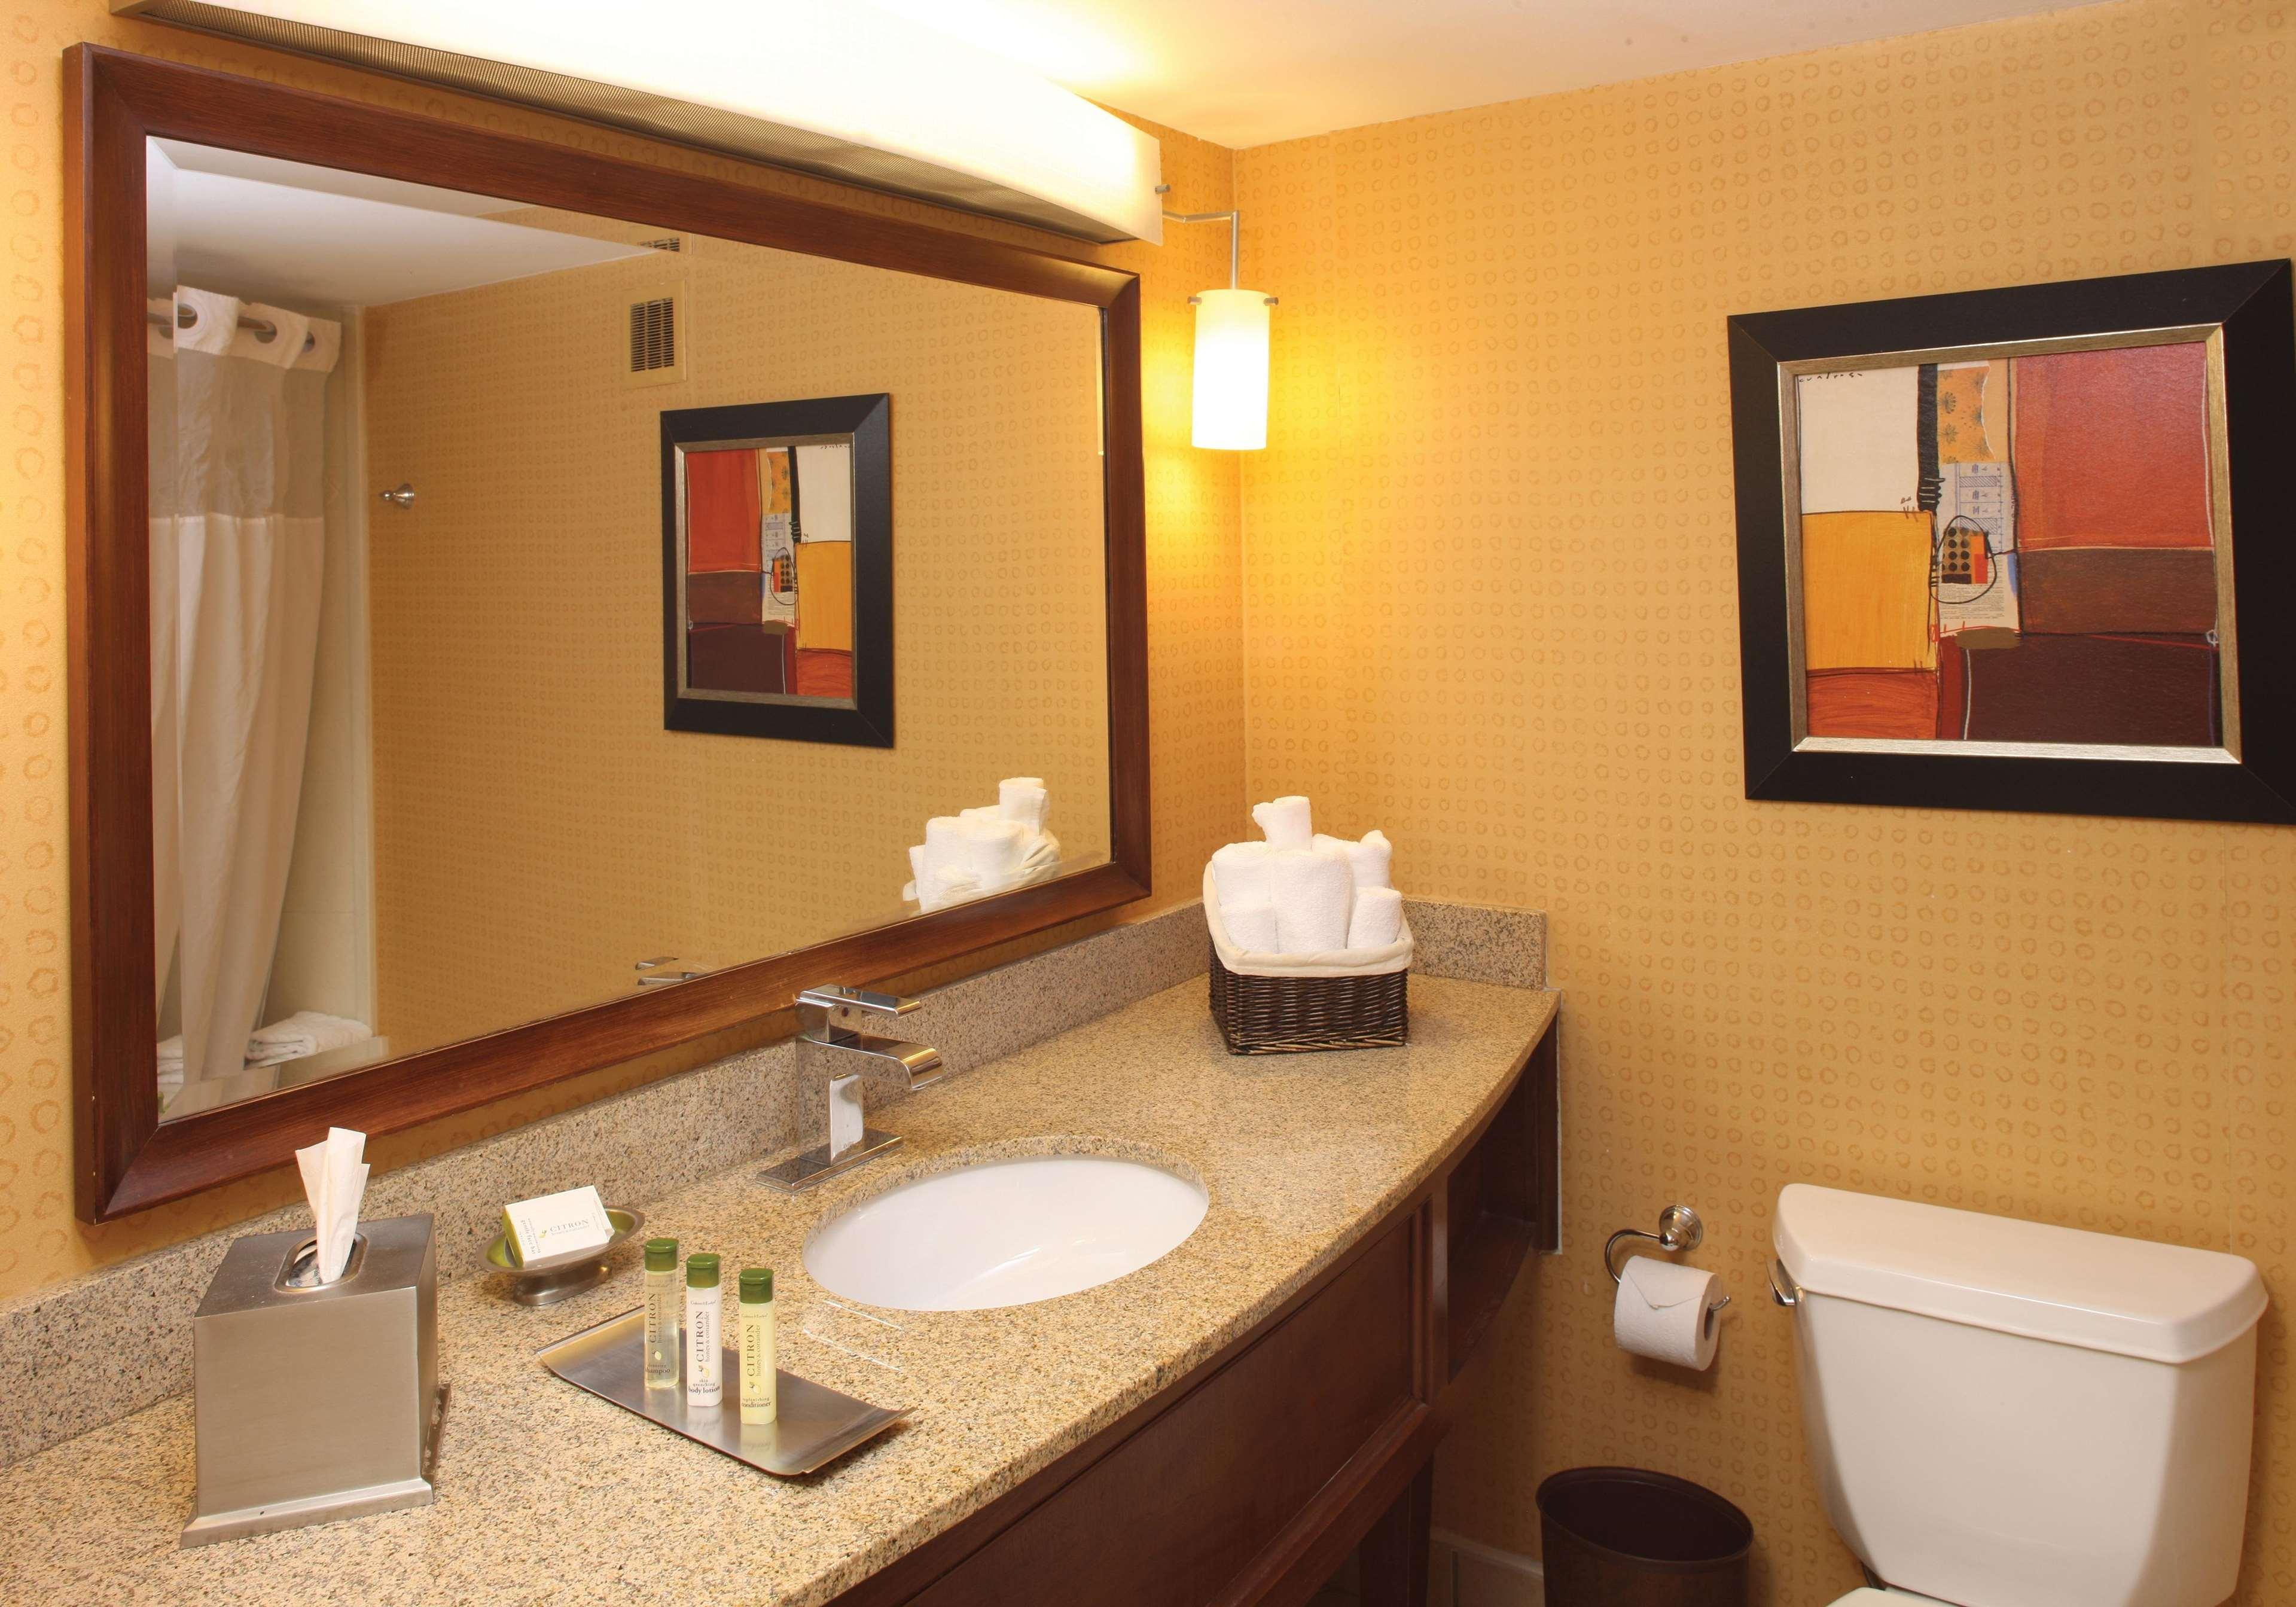 DoubleTree by Hilton Hotel Oak Ridge - Knoxville image 27